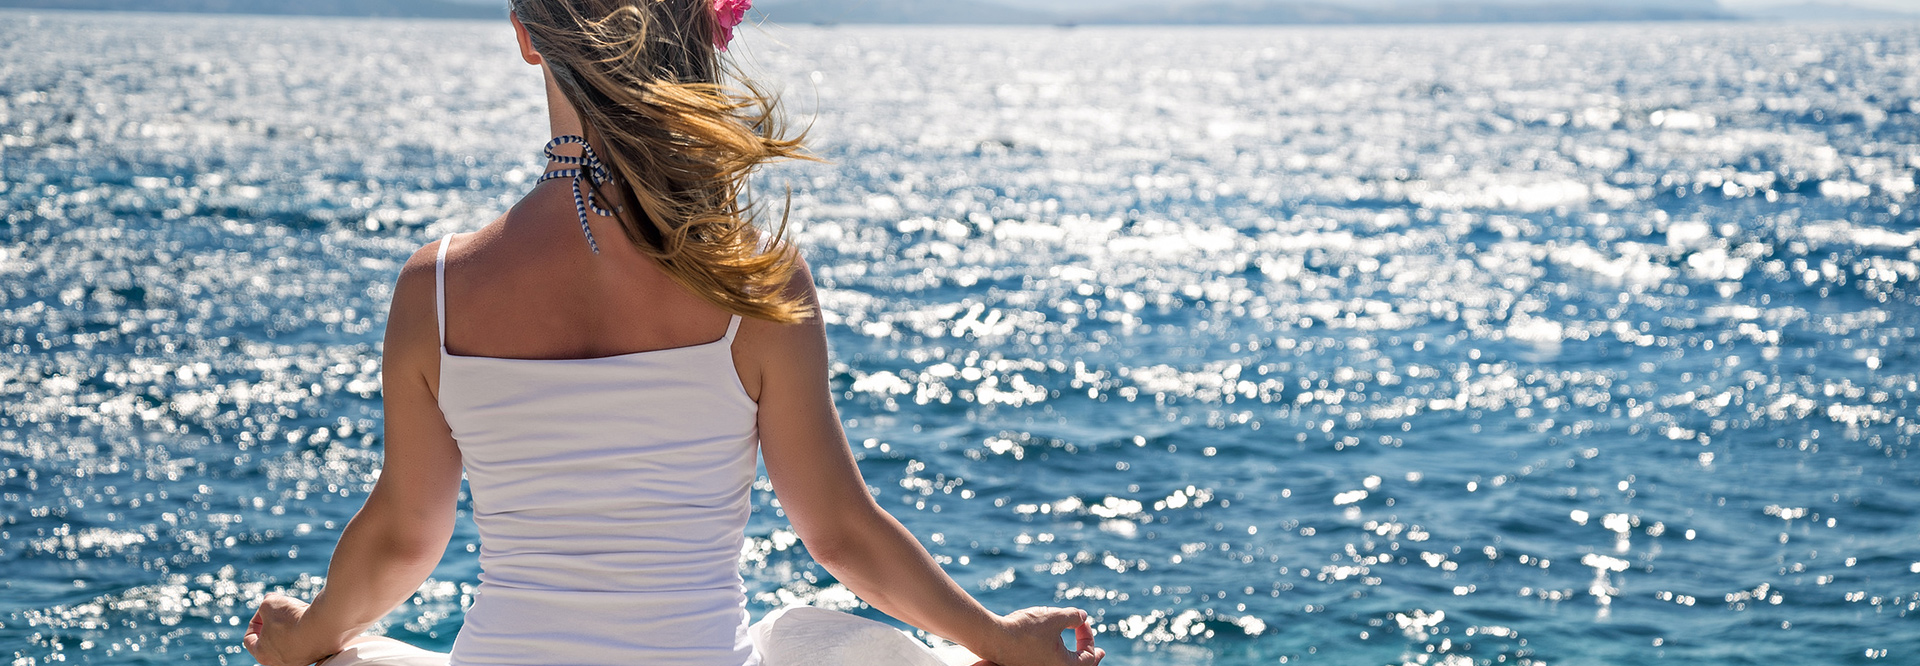 Yoga-Urlaub-Mallorca-s1